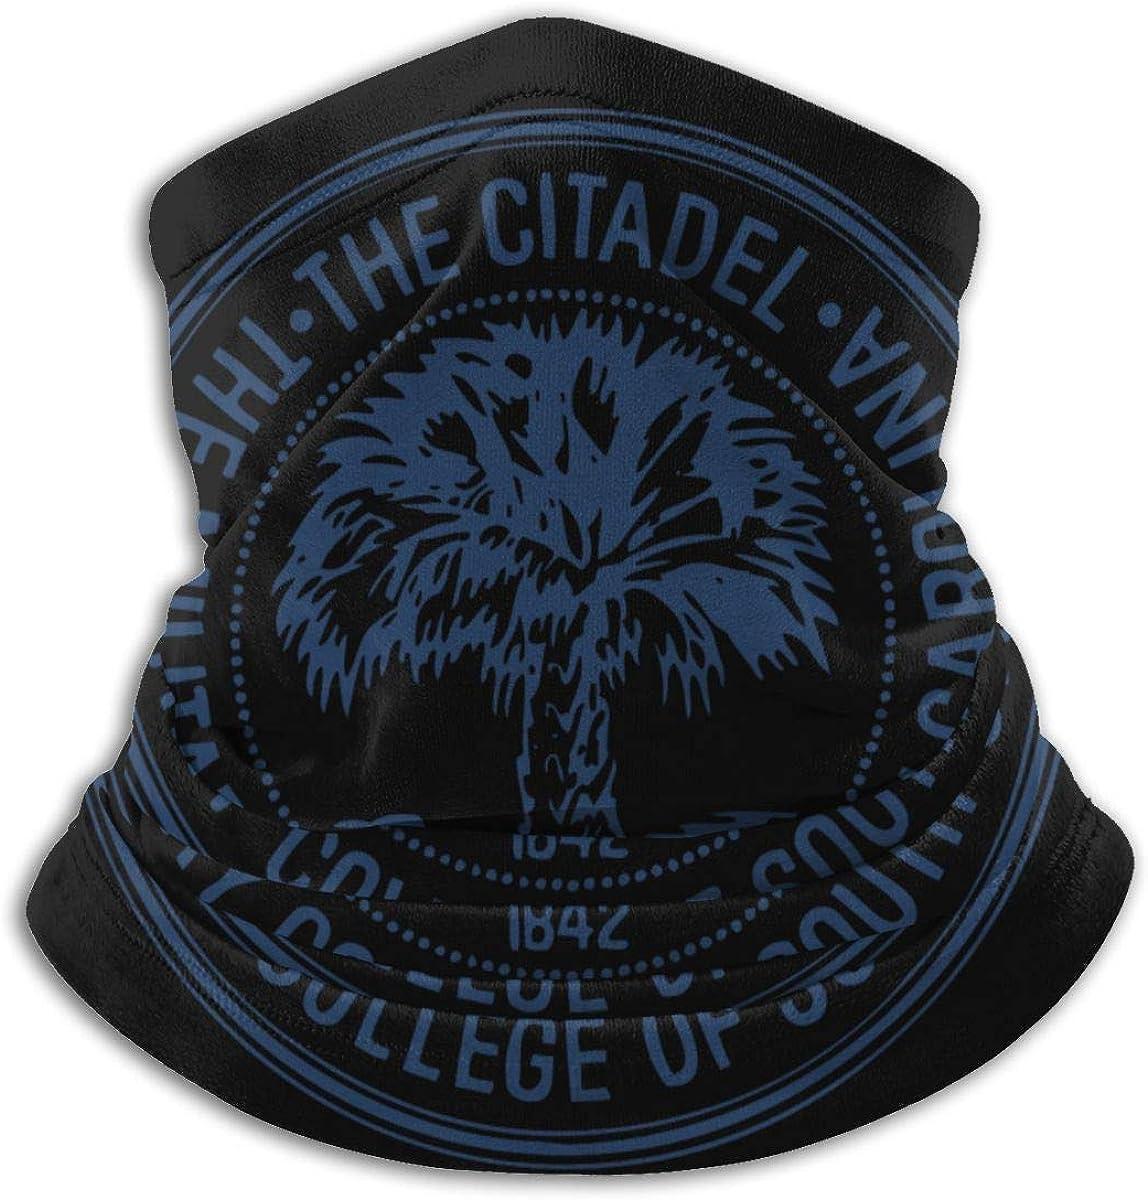 The Citadel, The Military College of South Carolina Unisex Microfiber Neck Warmer Neck Gaiter Face Mask Bandana Balaclava